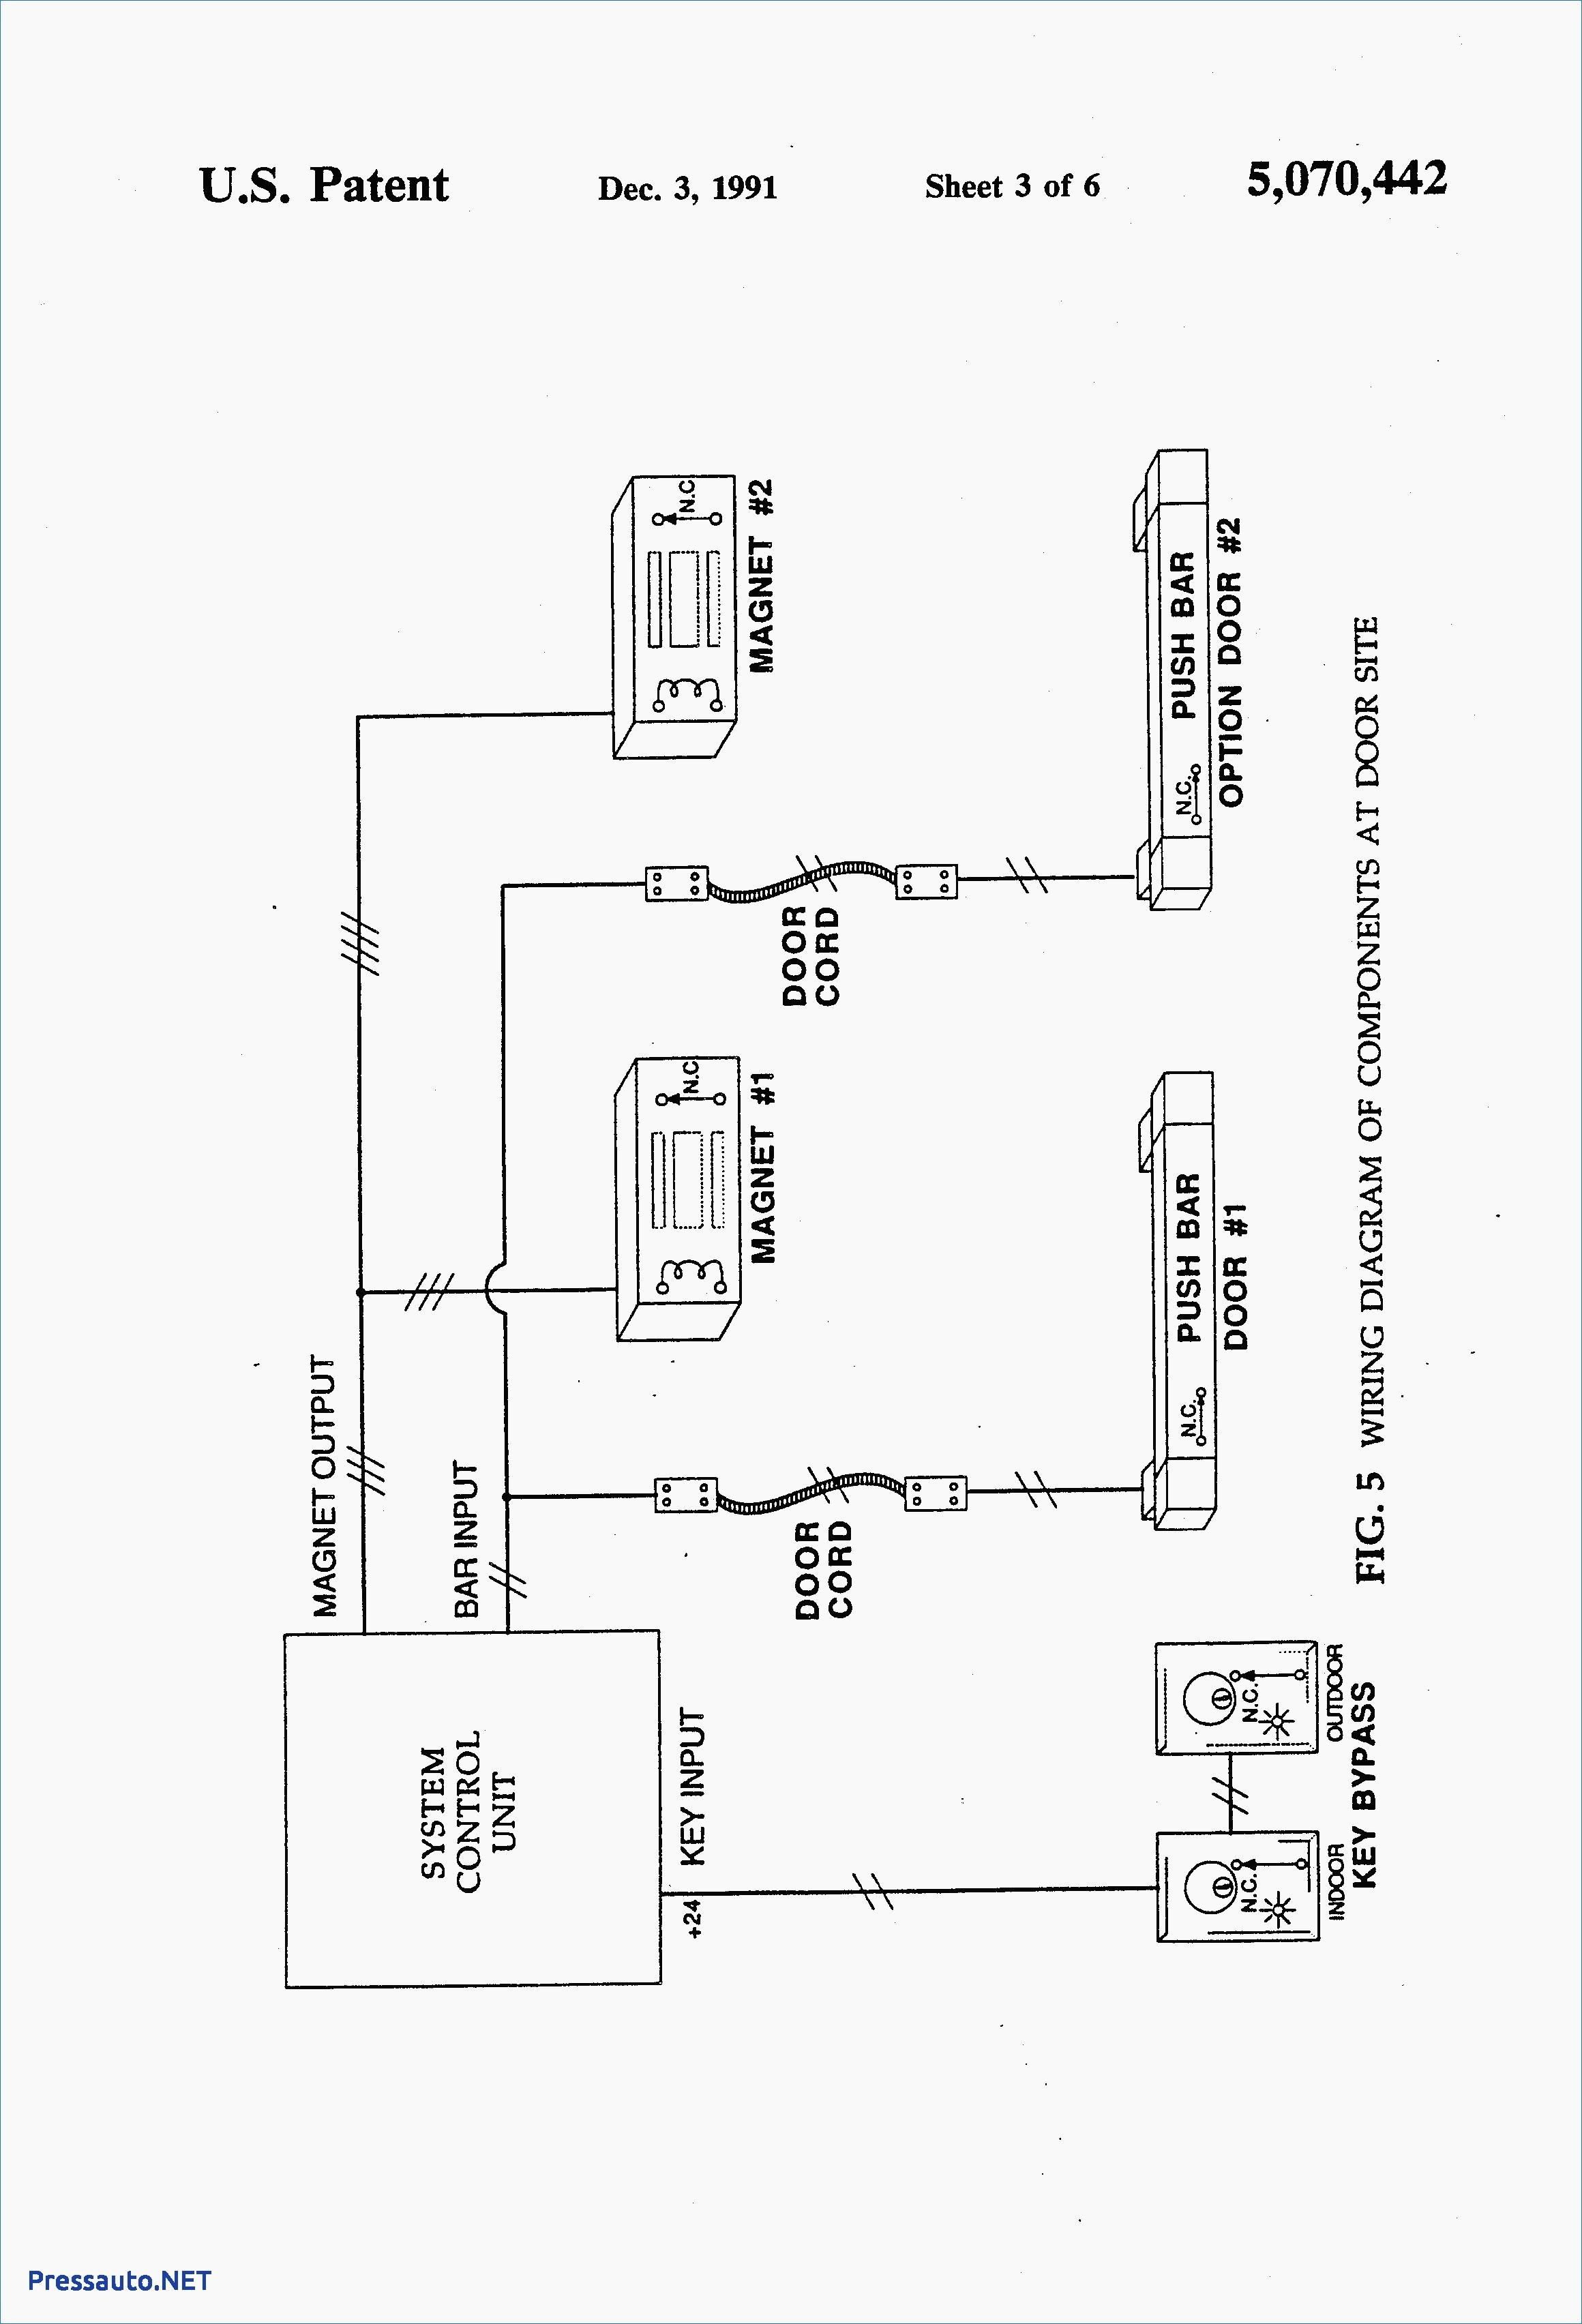 1 80 Trinary Switch Wiring Diagram 0 Natebird Me In